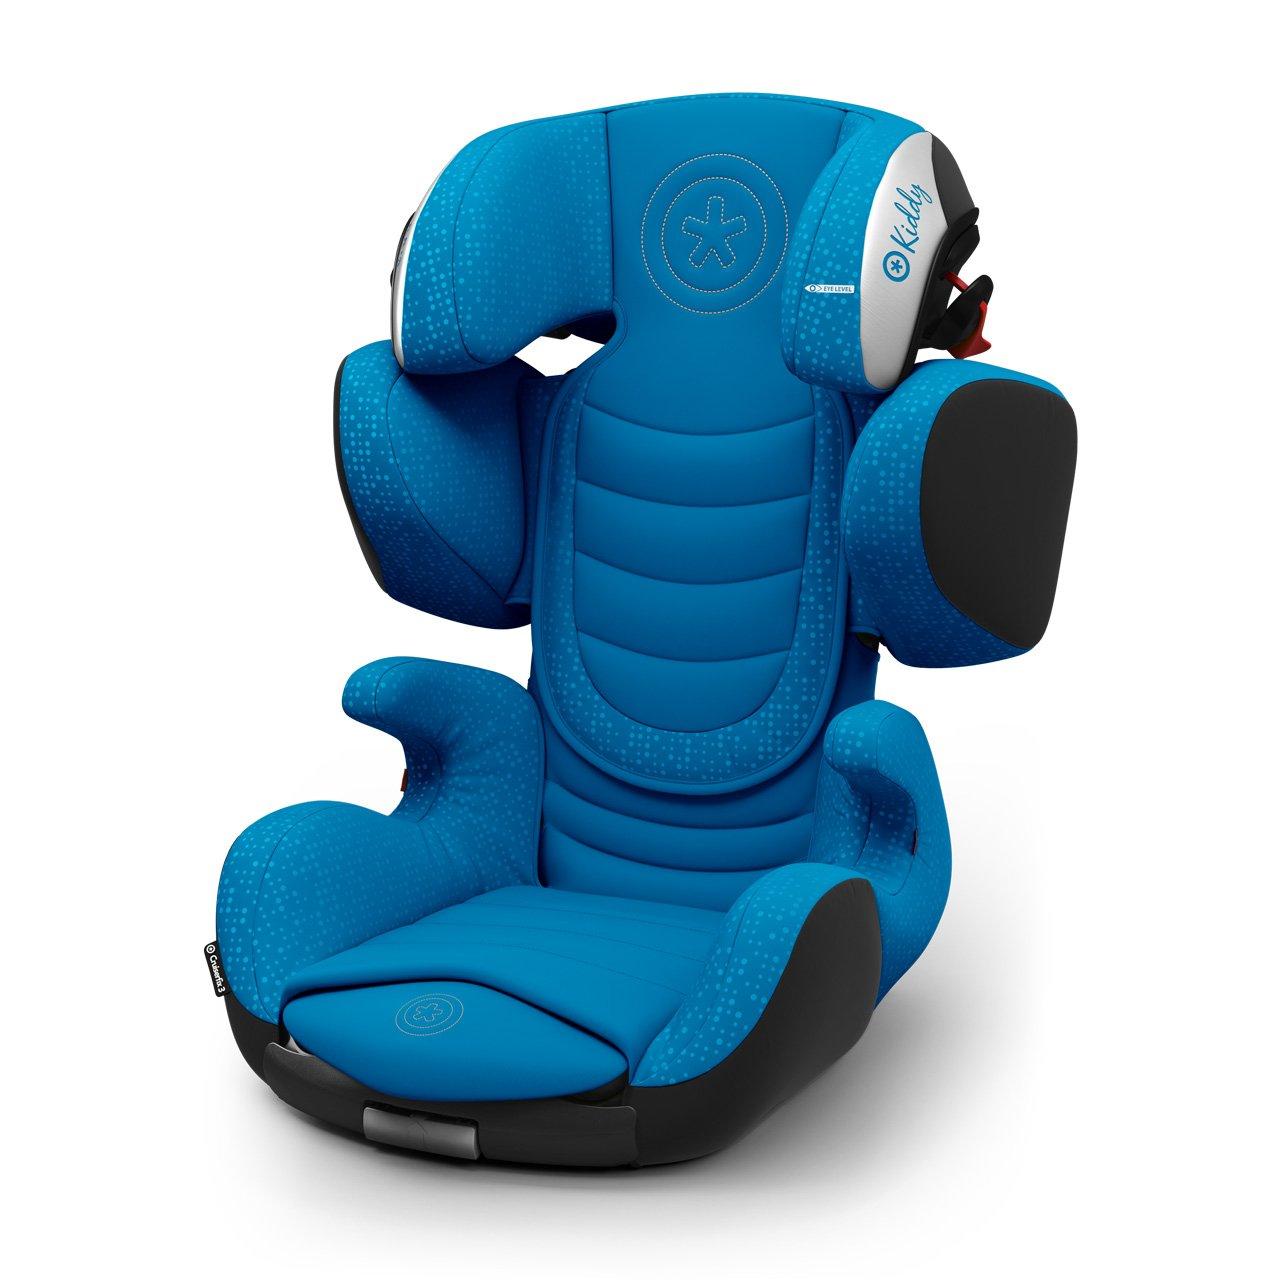 Silla de coche Cruiserfix 3 para niños mayores